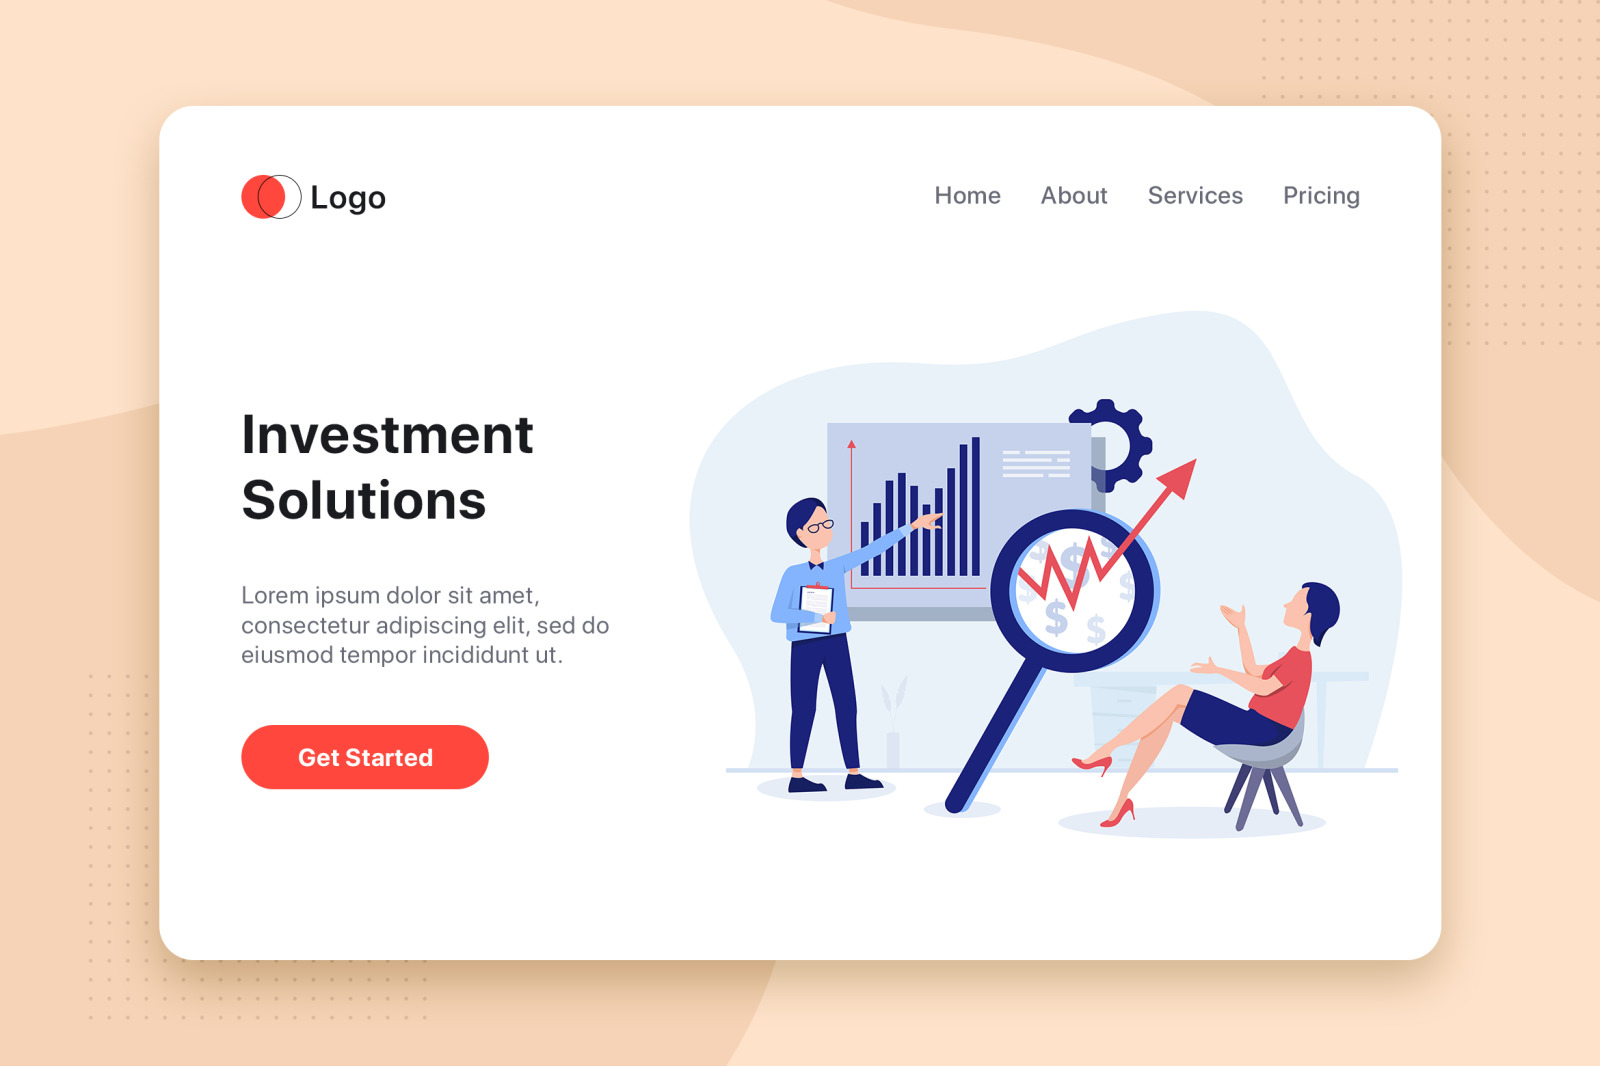 [Part 8] Website Illustrations Set